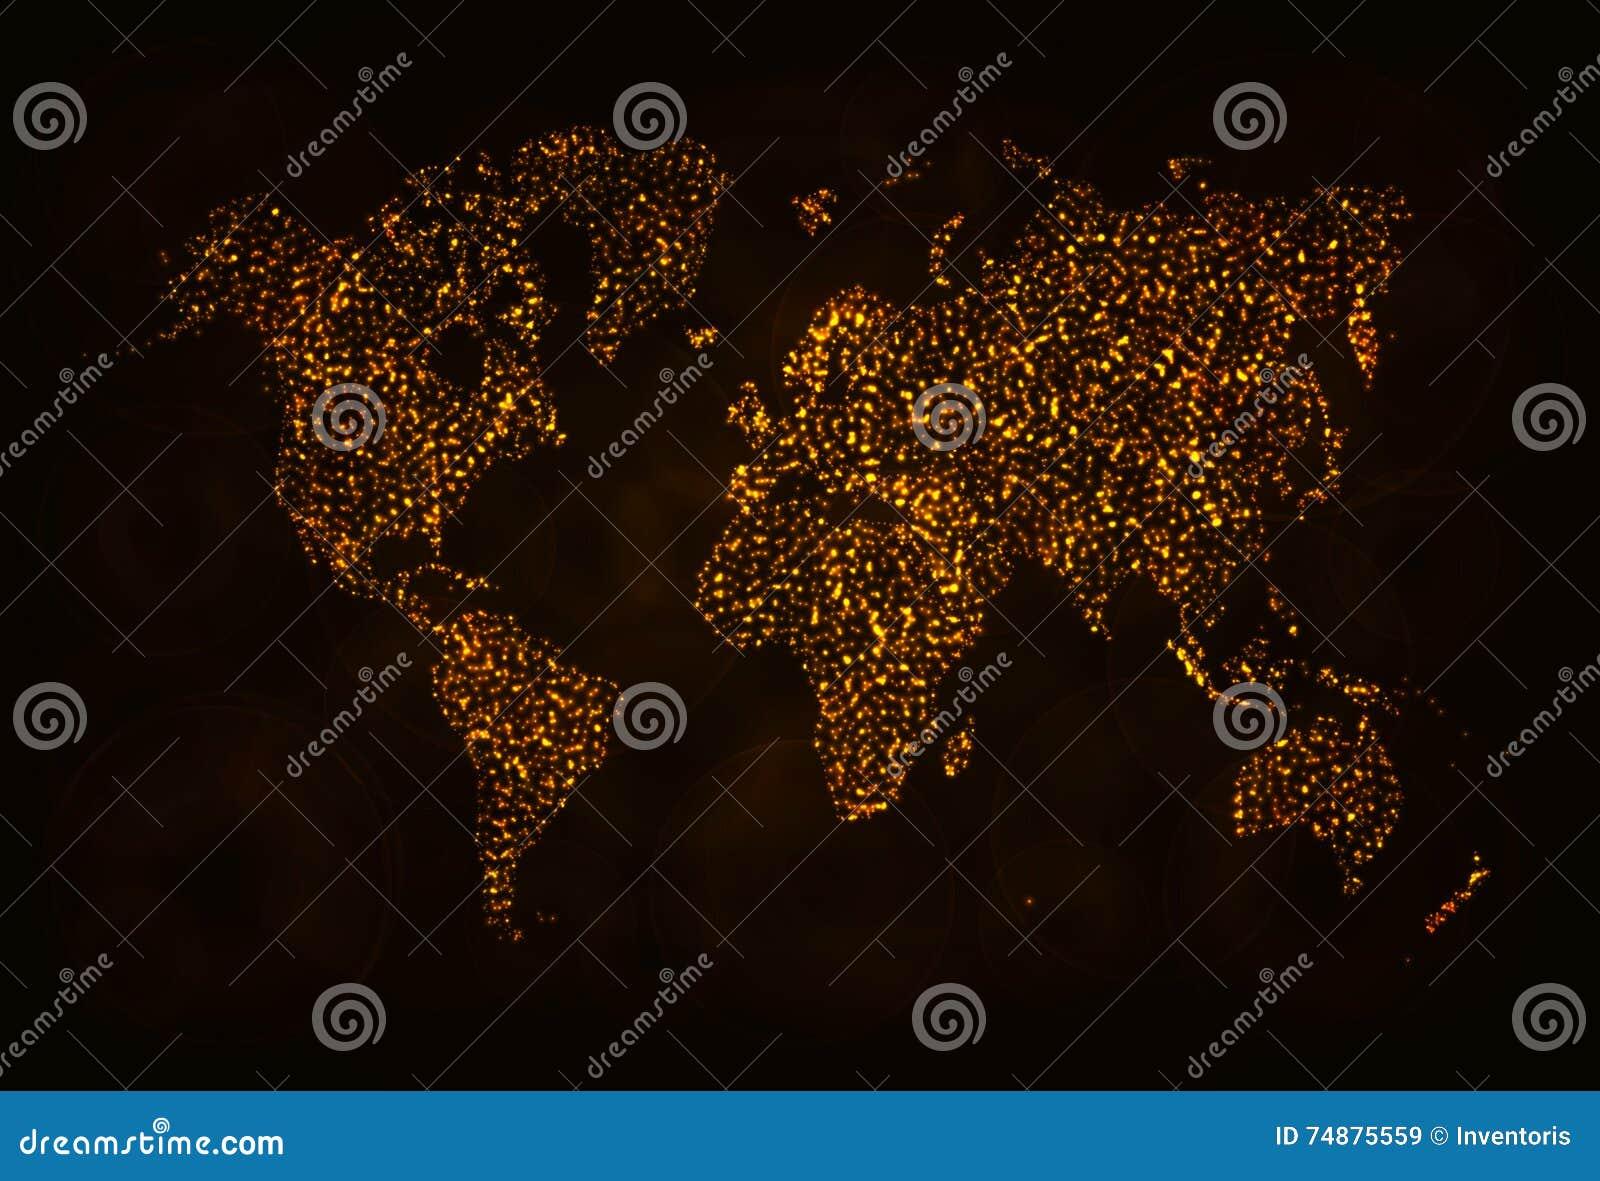 Silhueta do mapa das luzes no fundo escuro